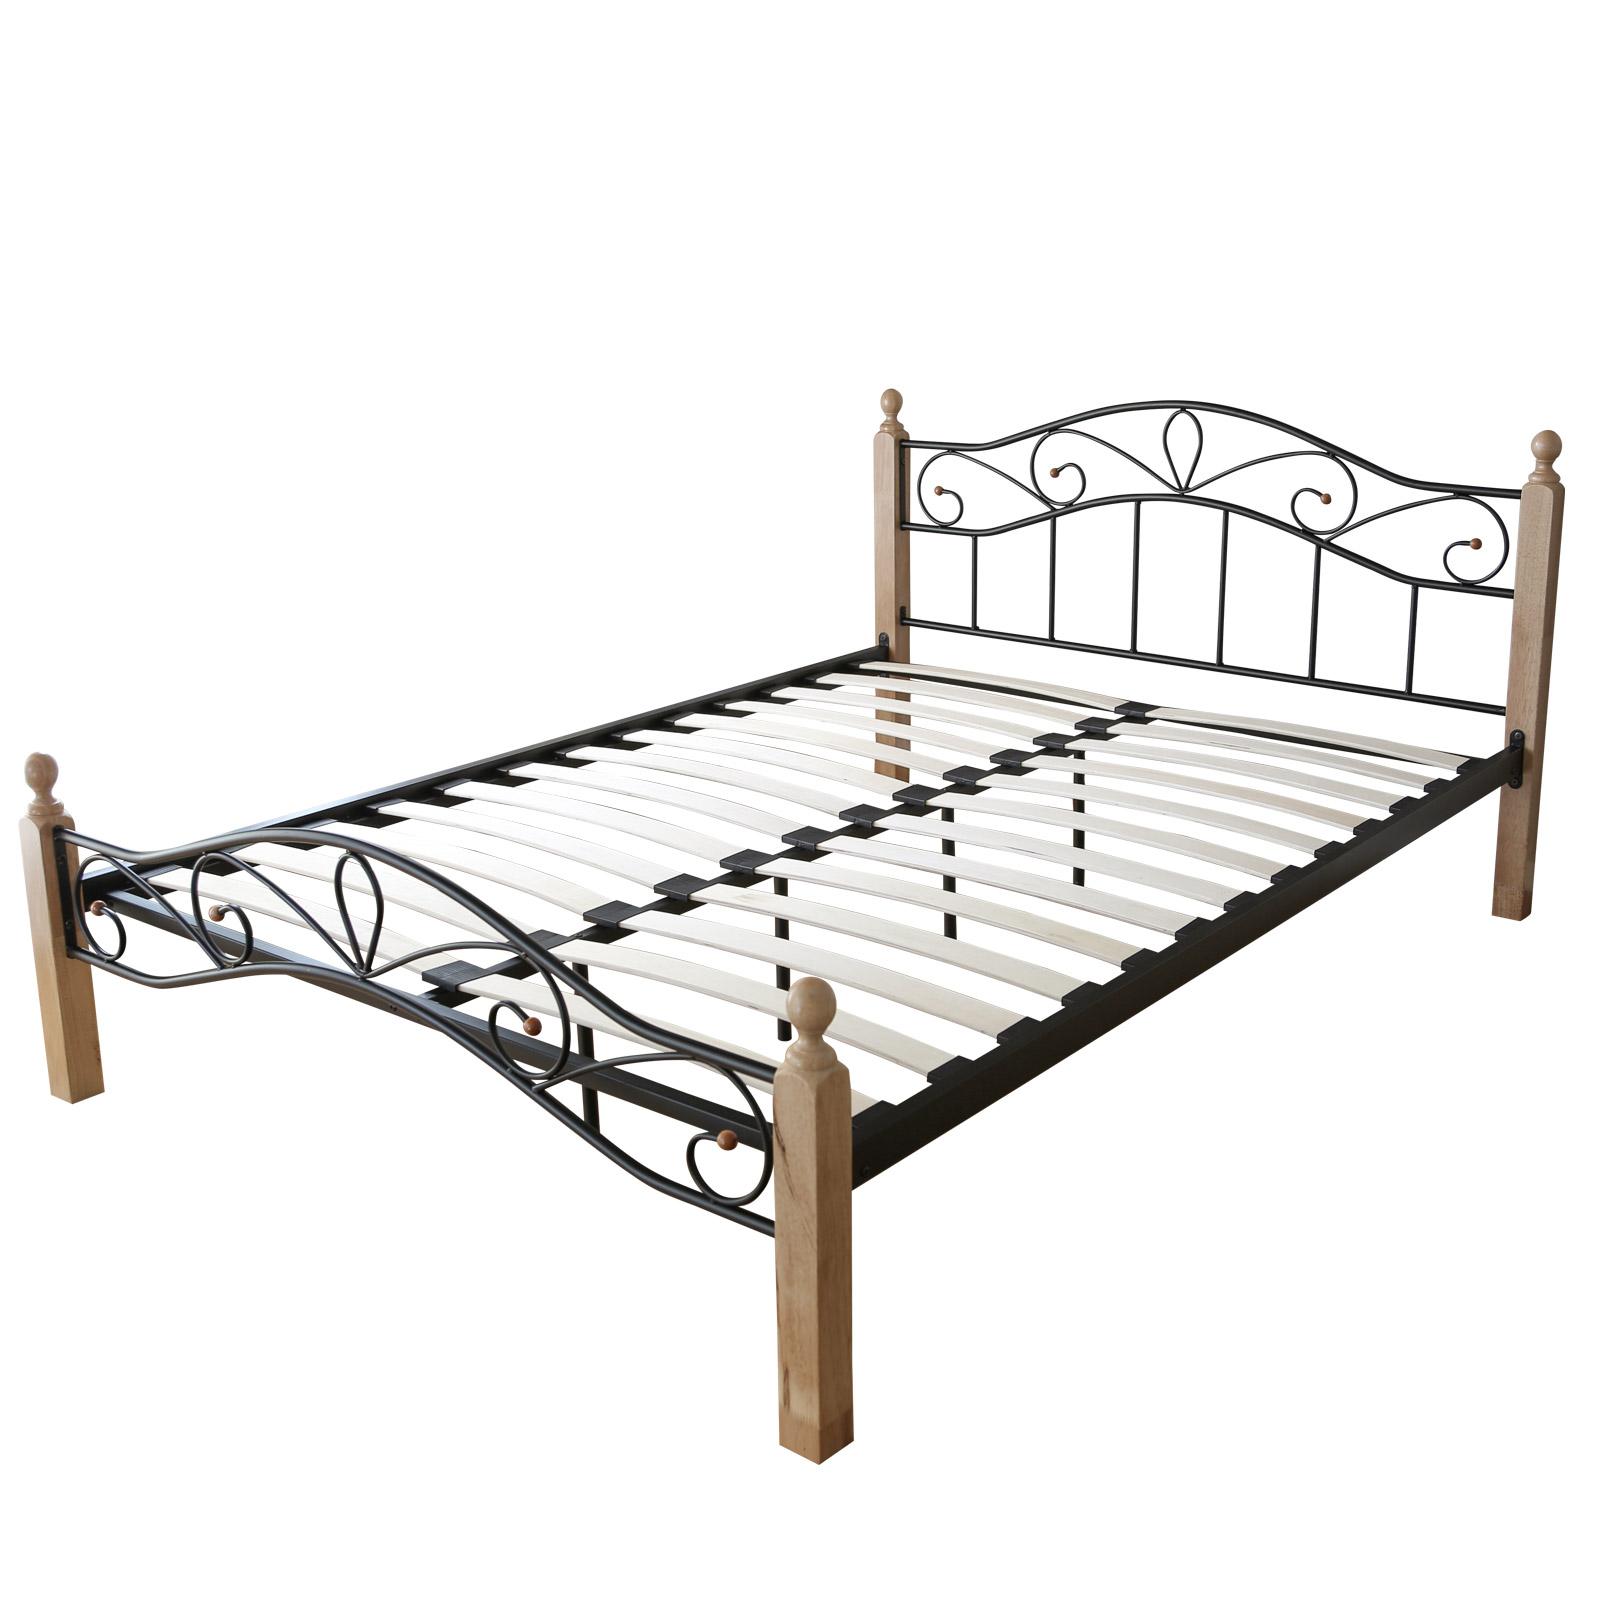 design metal lit double 140 x 200 cadre de lit lattes bois neuf 920 noir naturel ebay. Black Bedroom Furniture Sets. Home Design Ideas